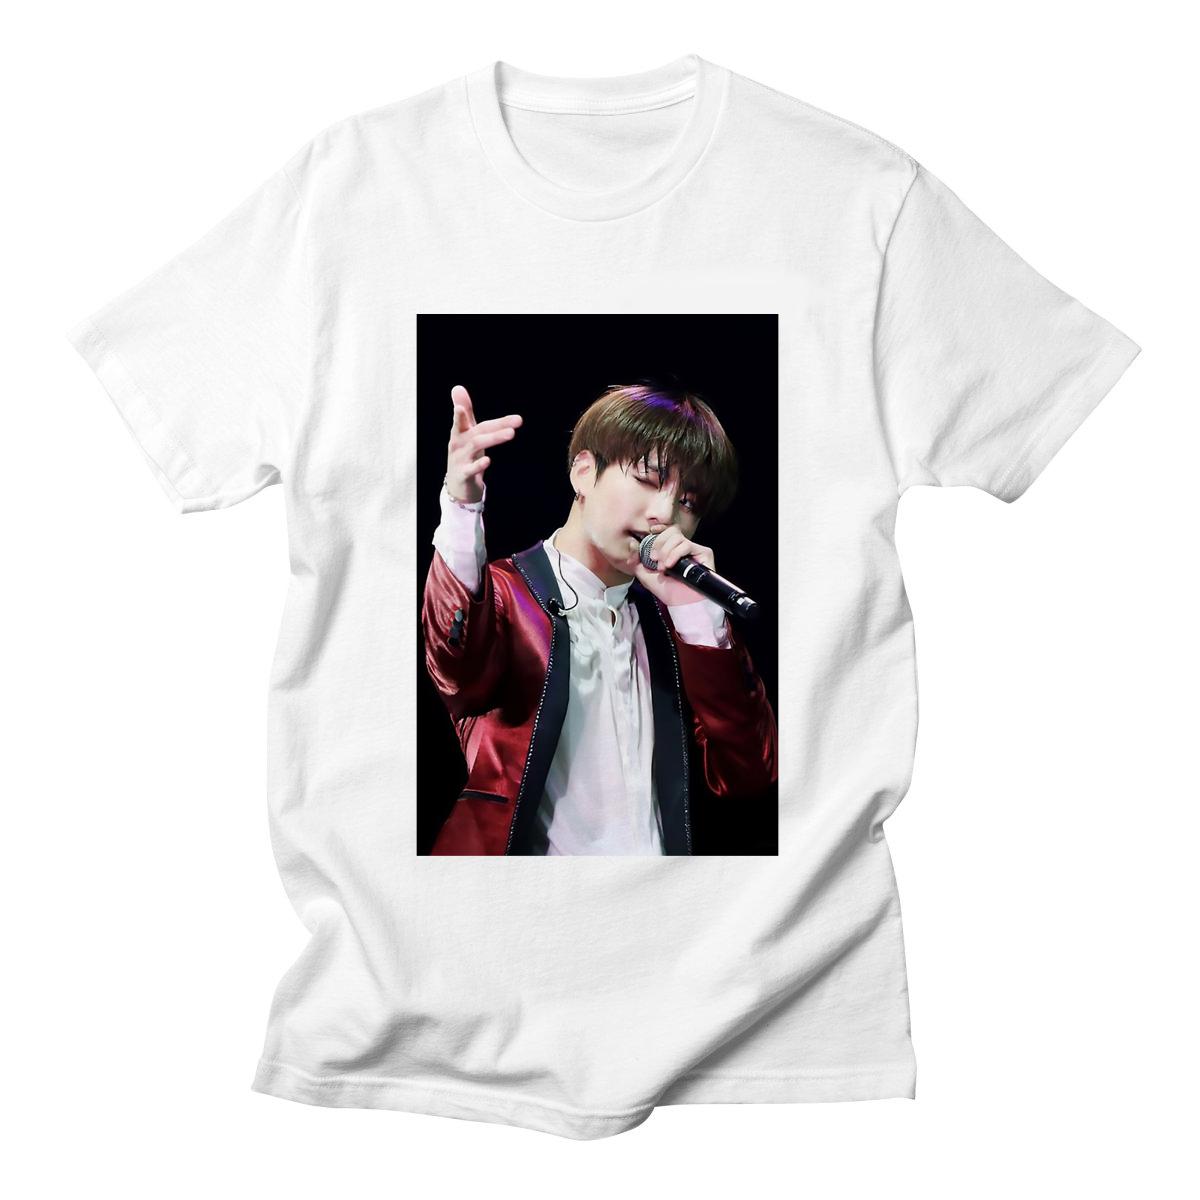 Detalle Comentarios Preguntas sobre Voltreffer Kpop BTS camiseta ... d151ca601e067